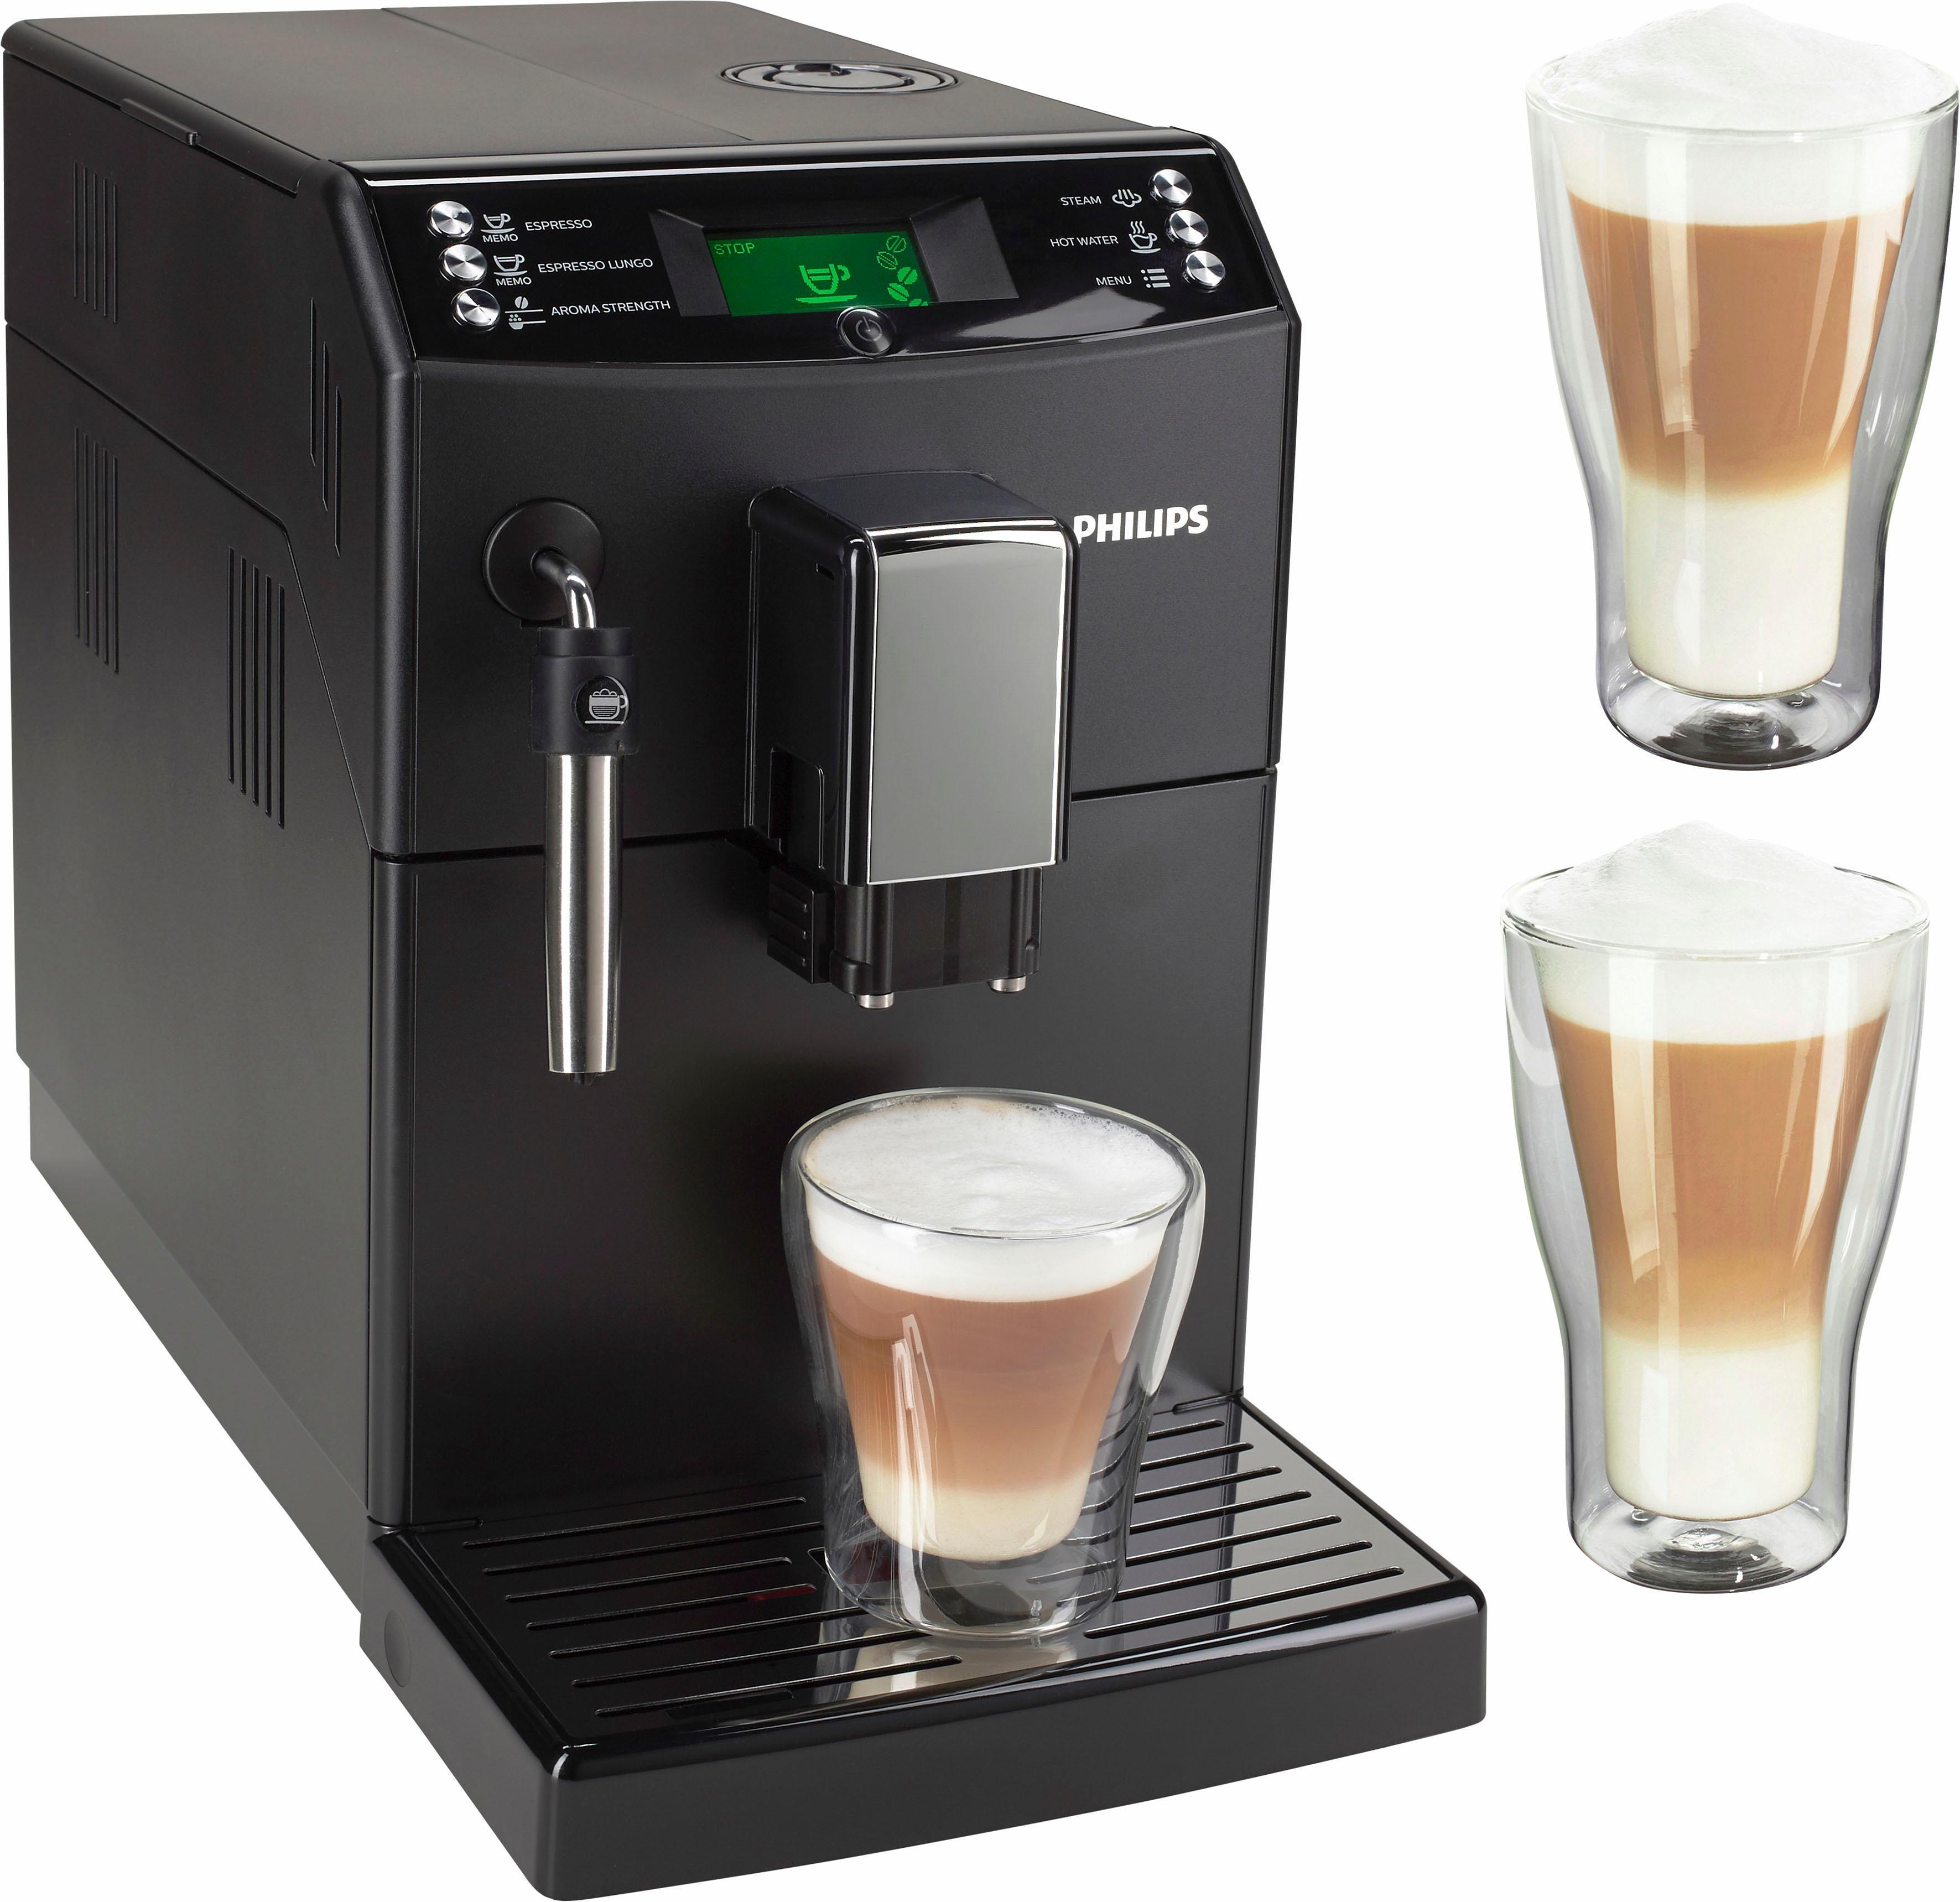 Philips Kaffeevollautomat HD8831/01 inklusive 2x Latte Macchiato Gläser